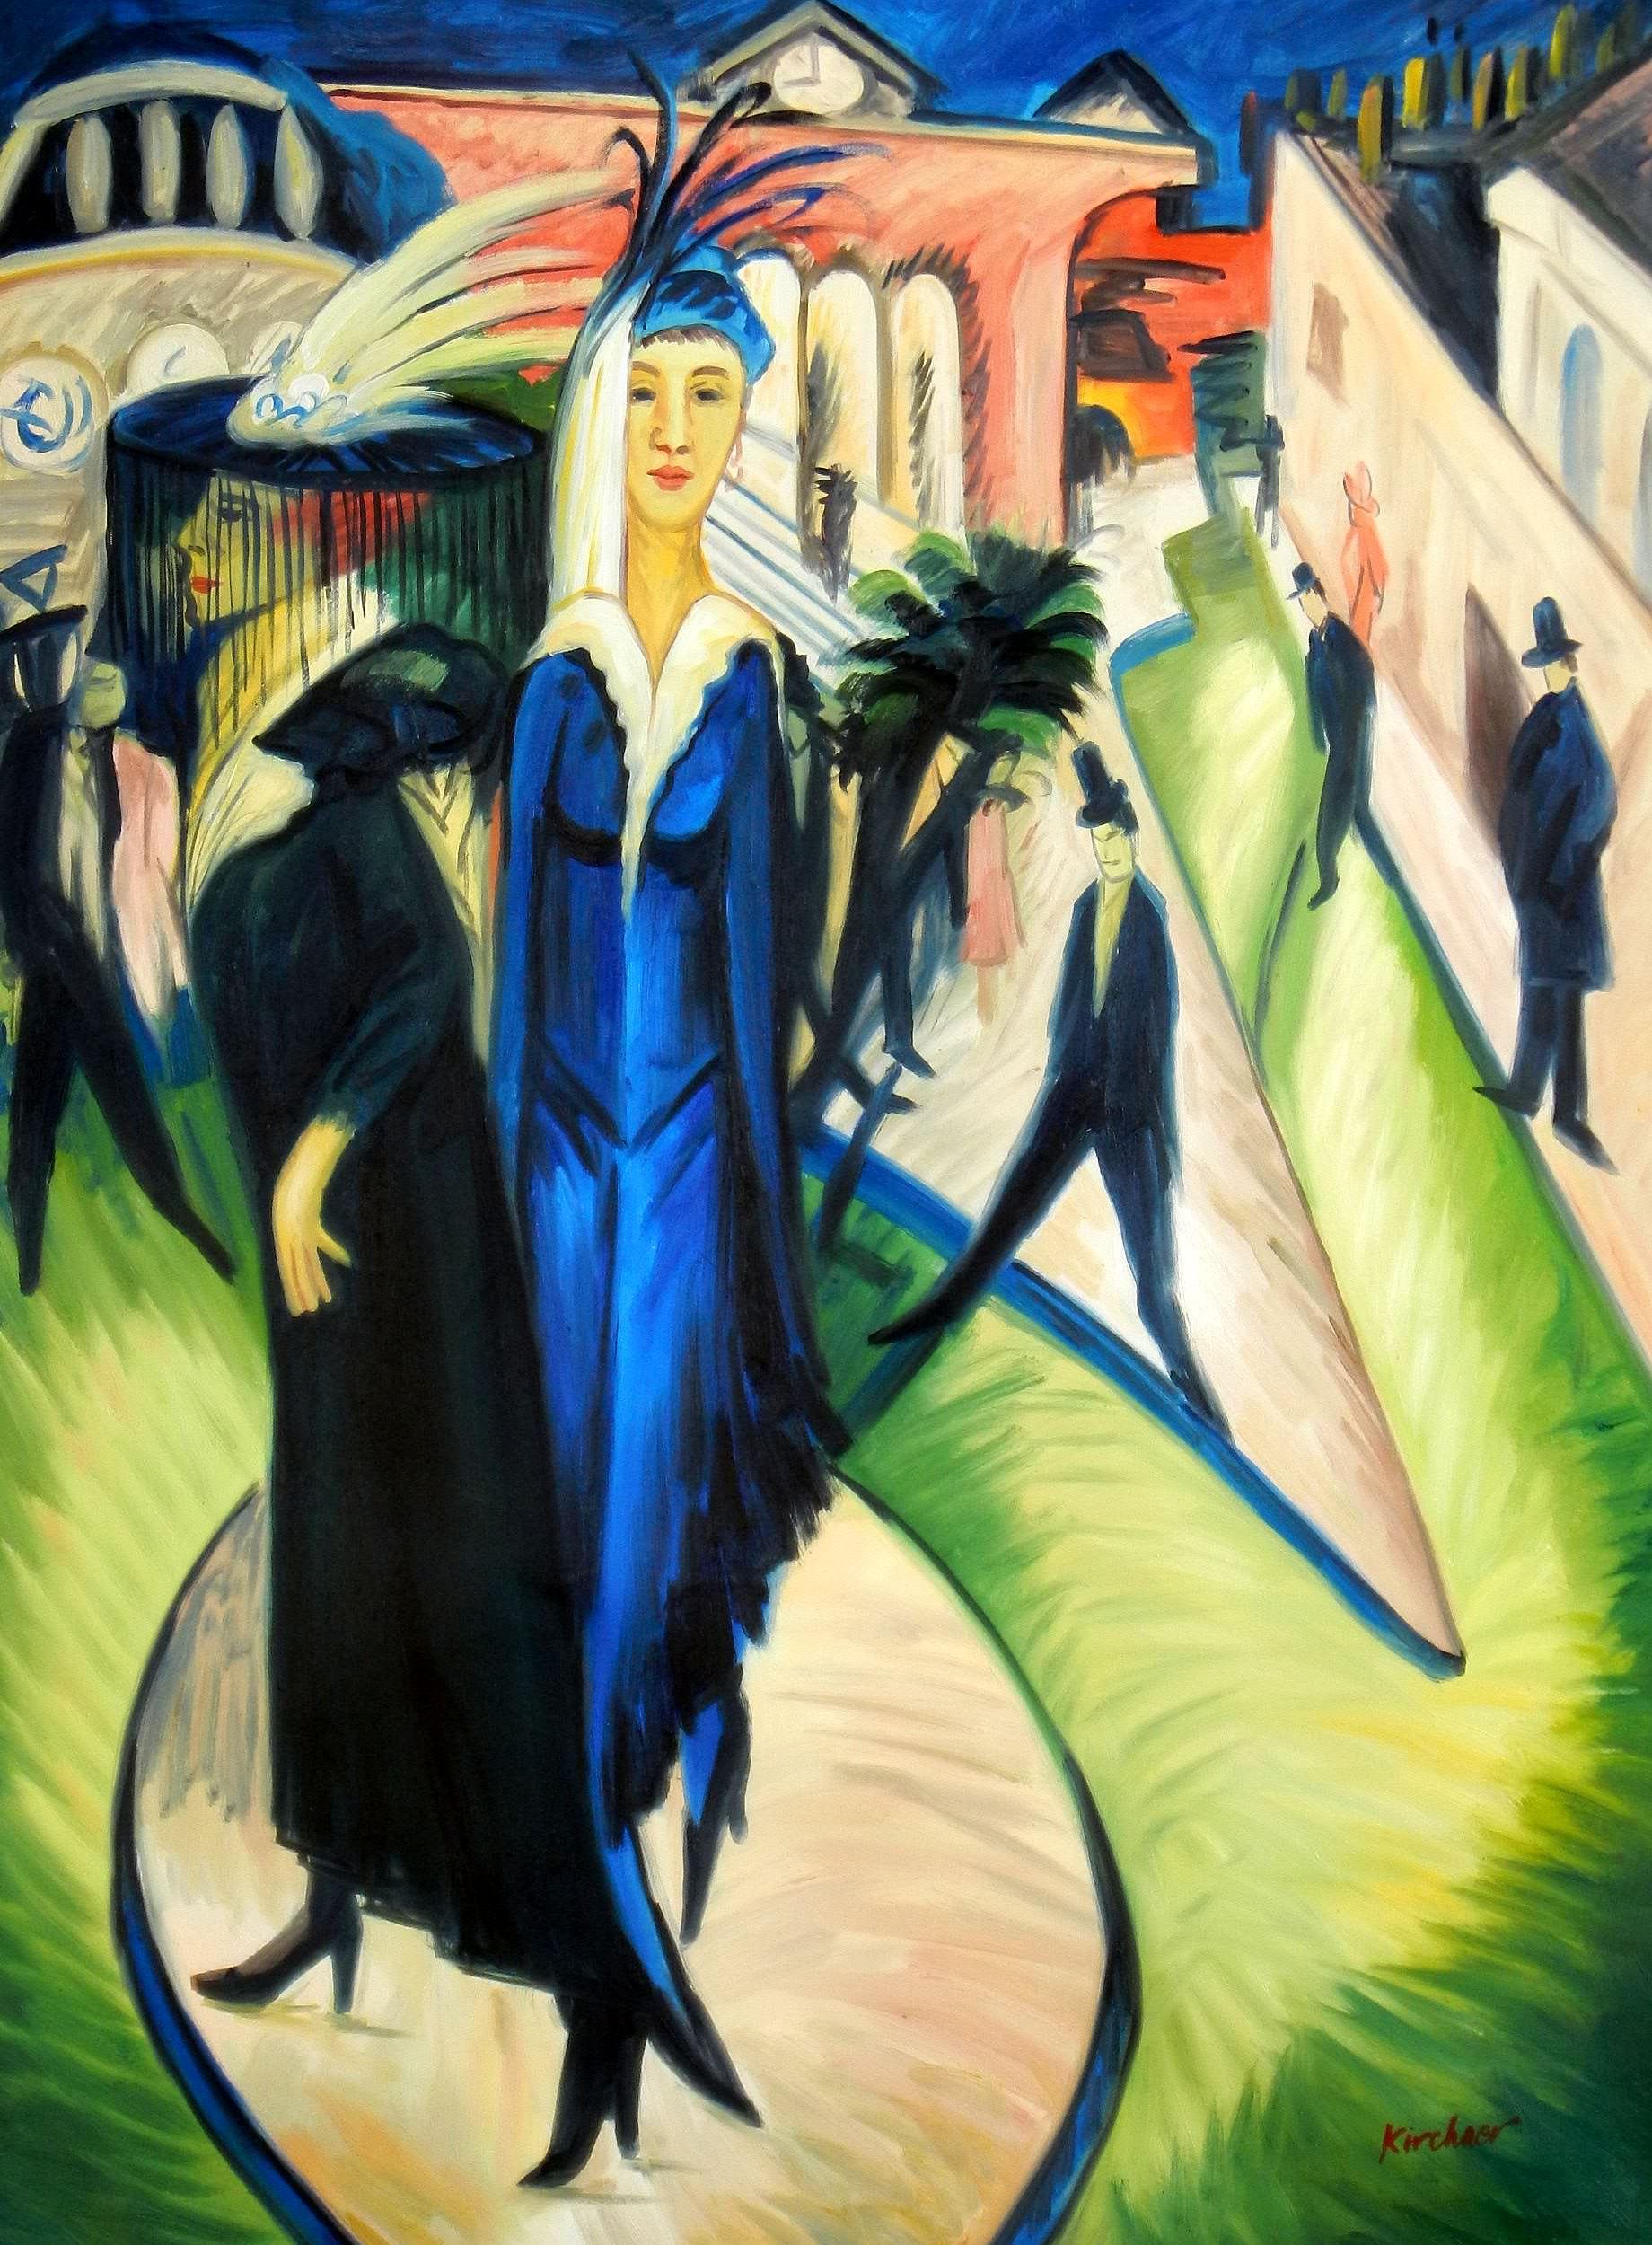 Ernst Ludwig Kirchner - Potsdamer Platz i93789 80x110cm exquisites Ölbild